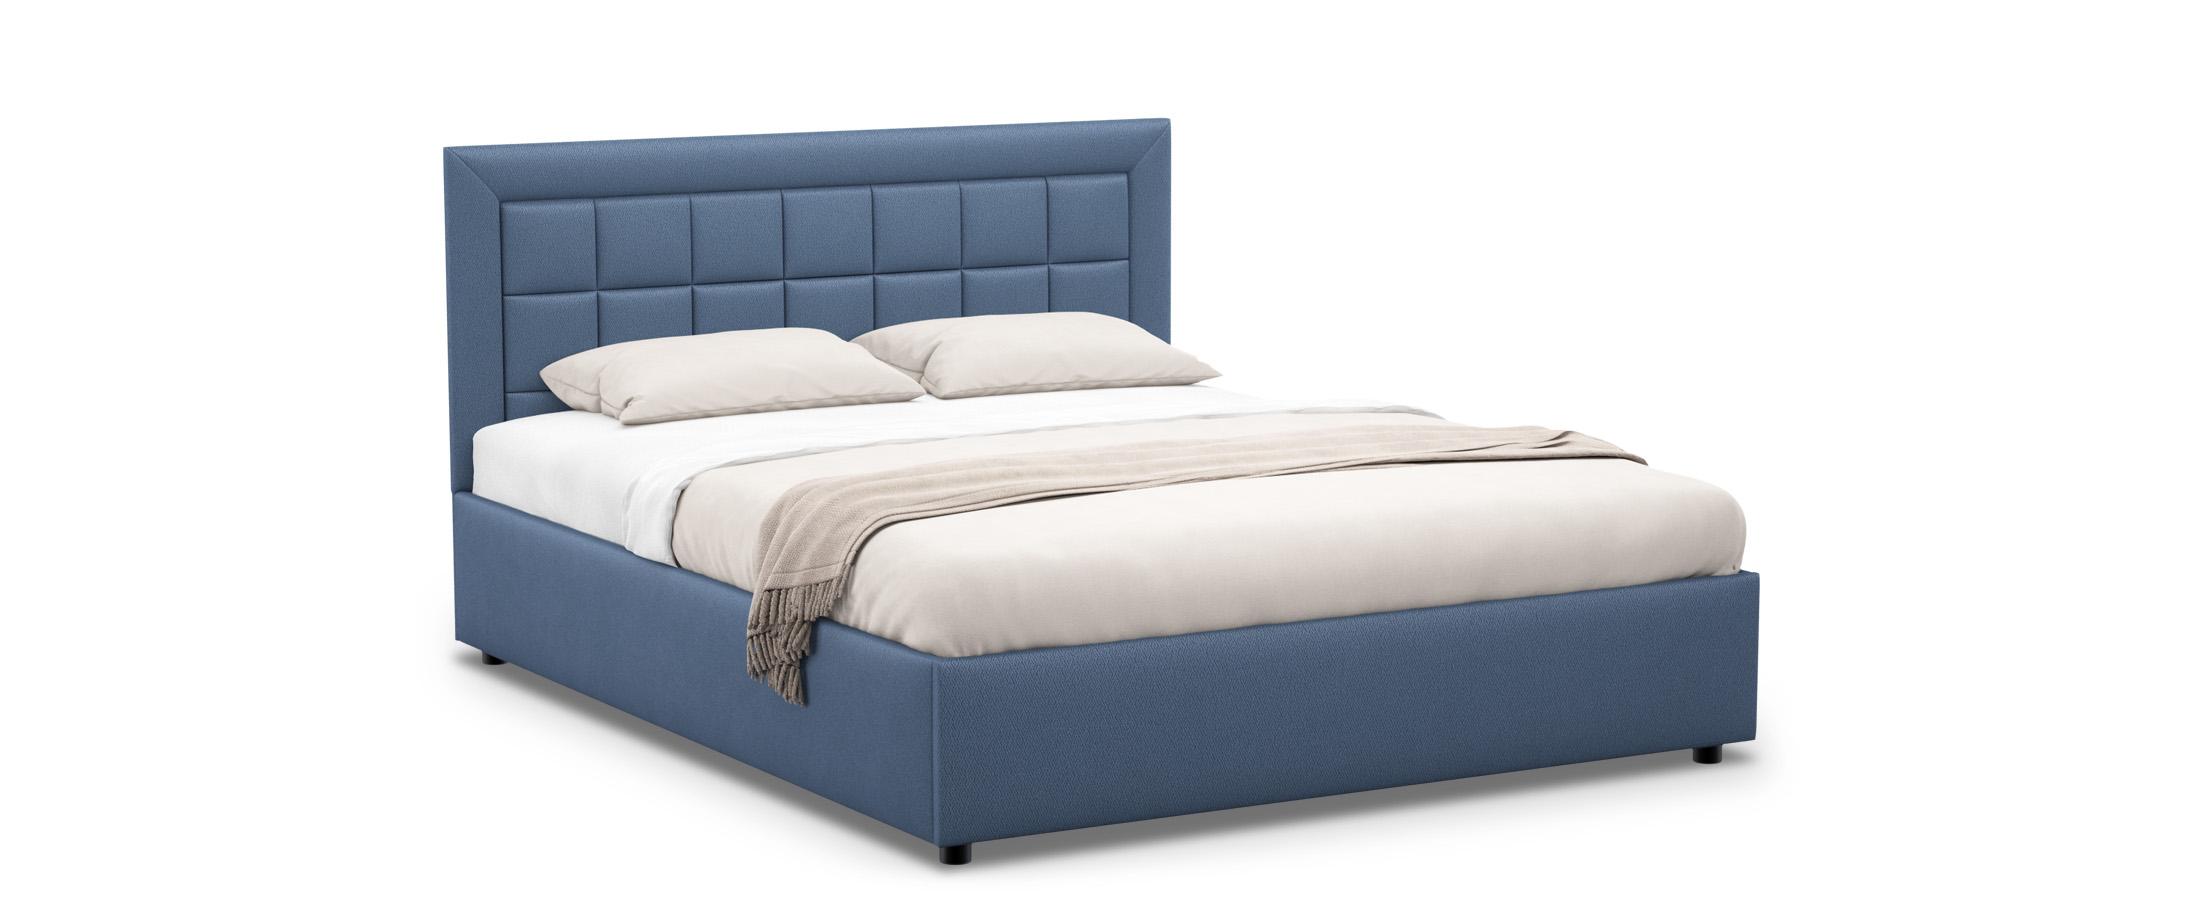 Кровать двуспальная Noemi New 160х200 Модель 1222 фото